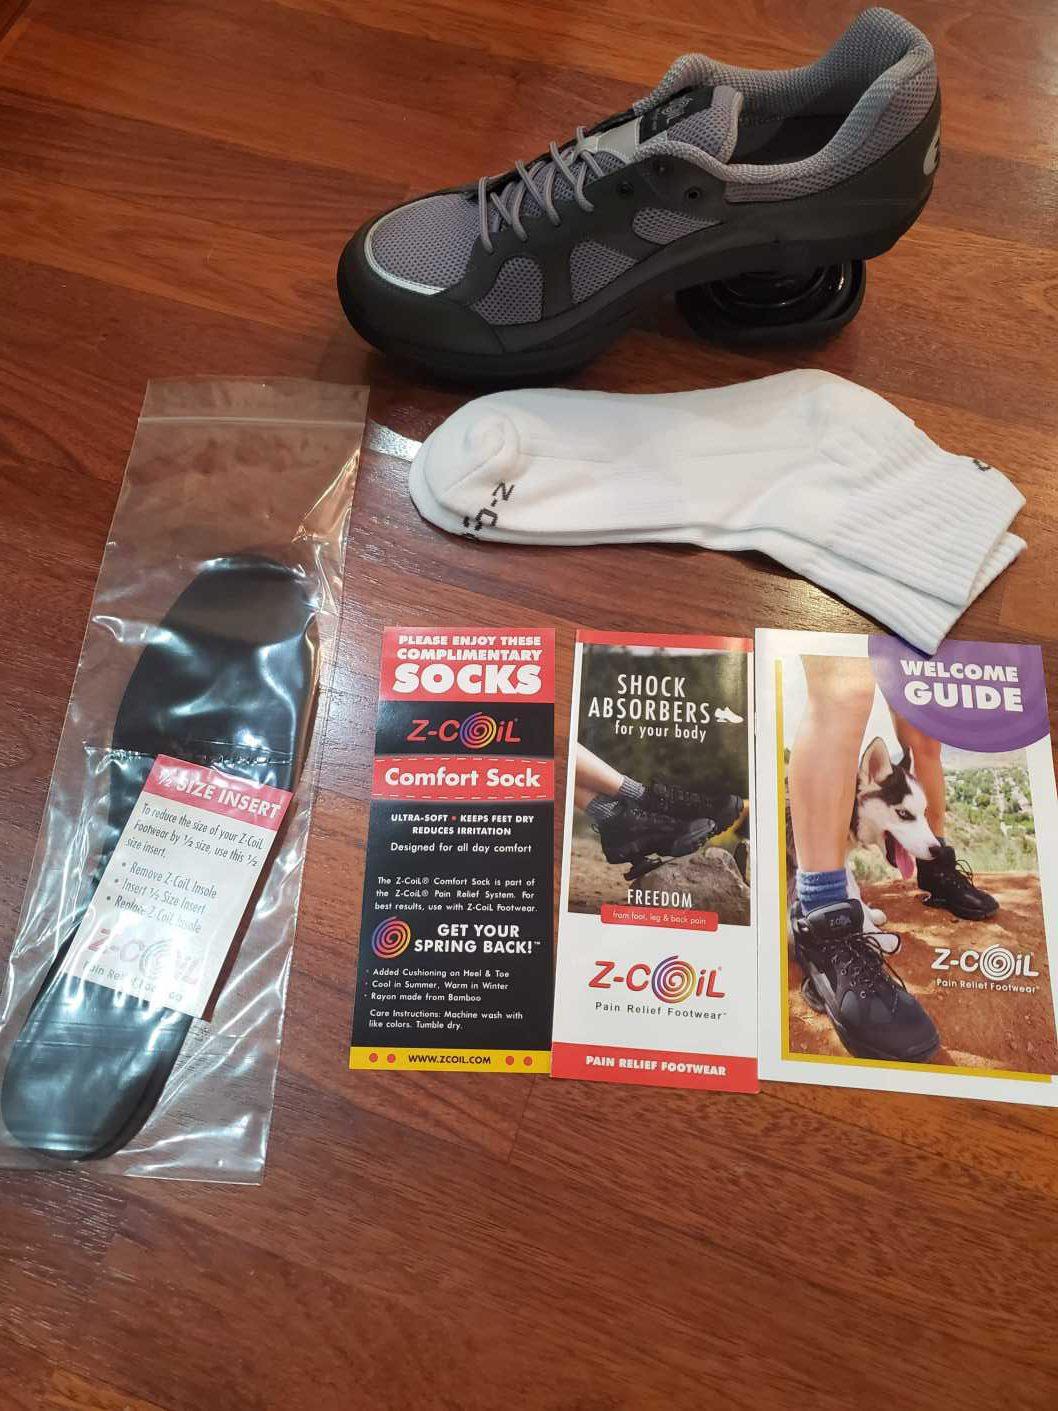 My Z Coil Footwear package